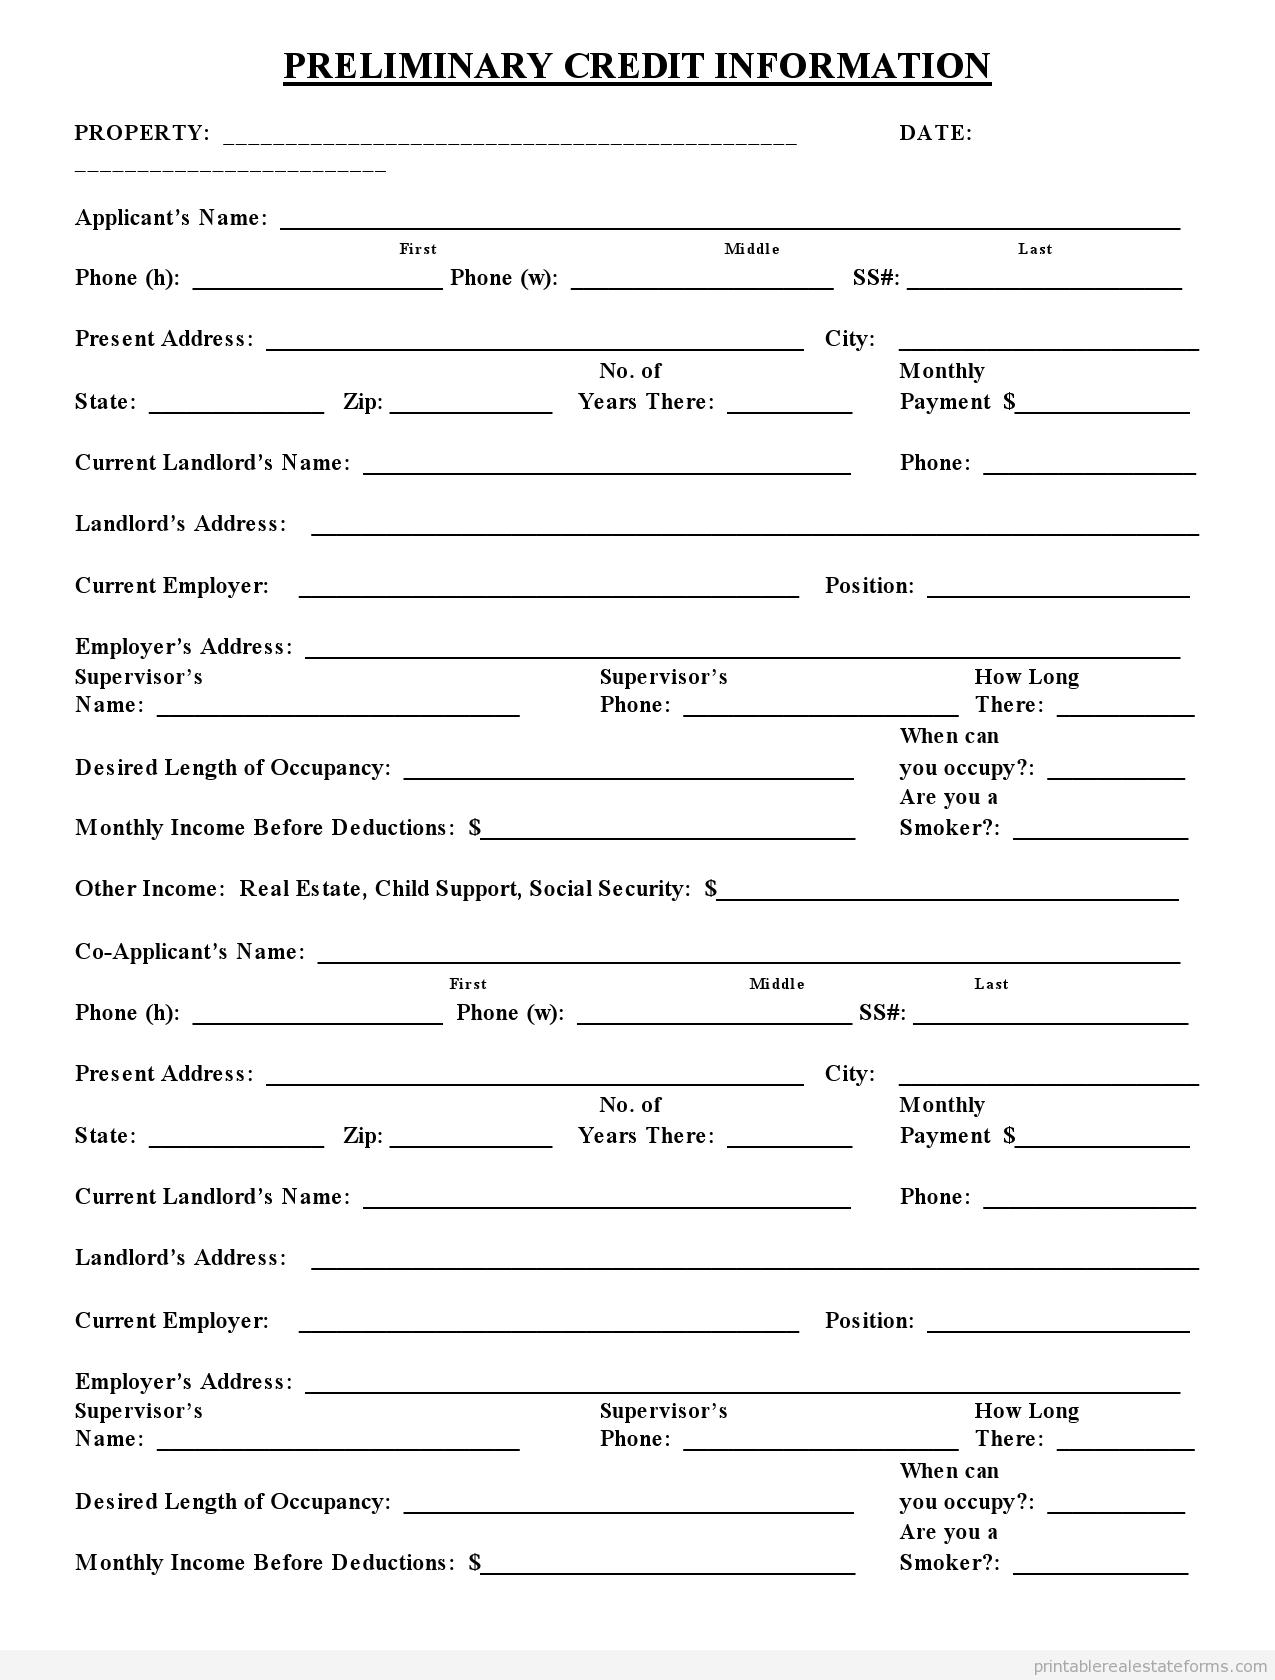 Free Printable Preliminary Credit Application Form Pdf